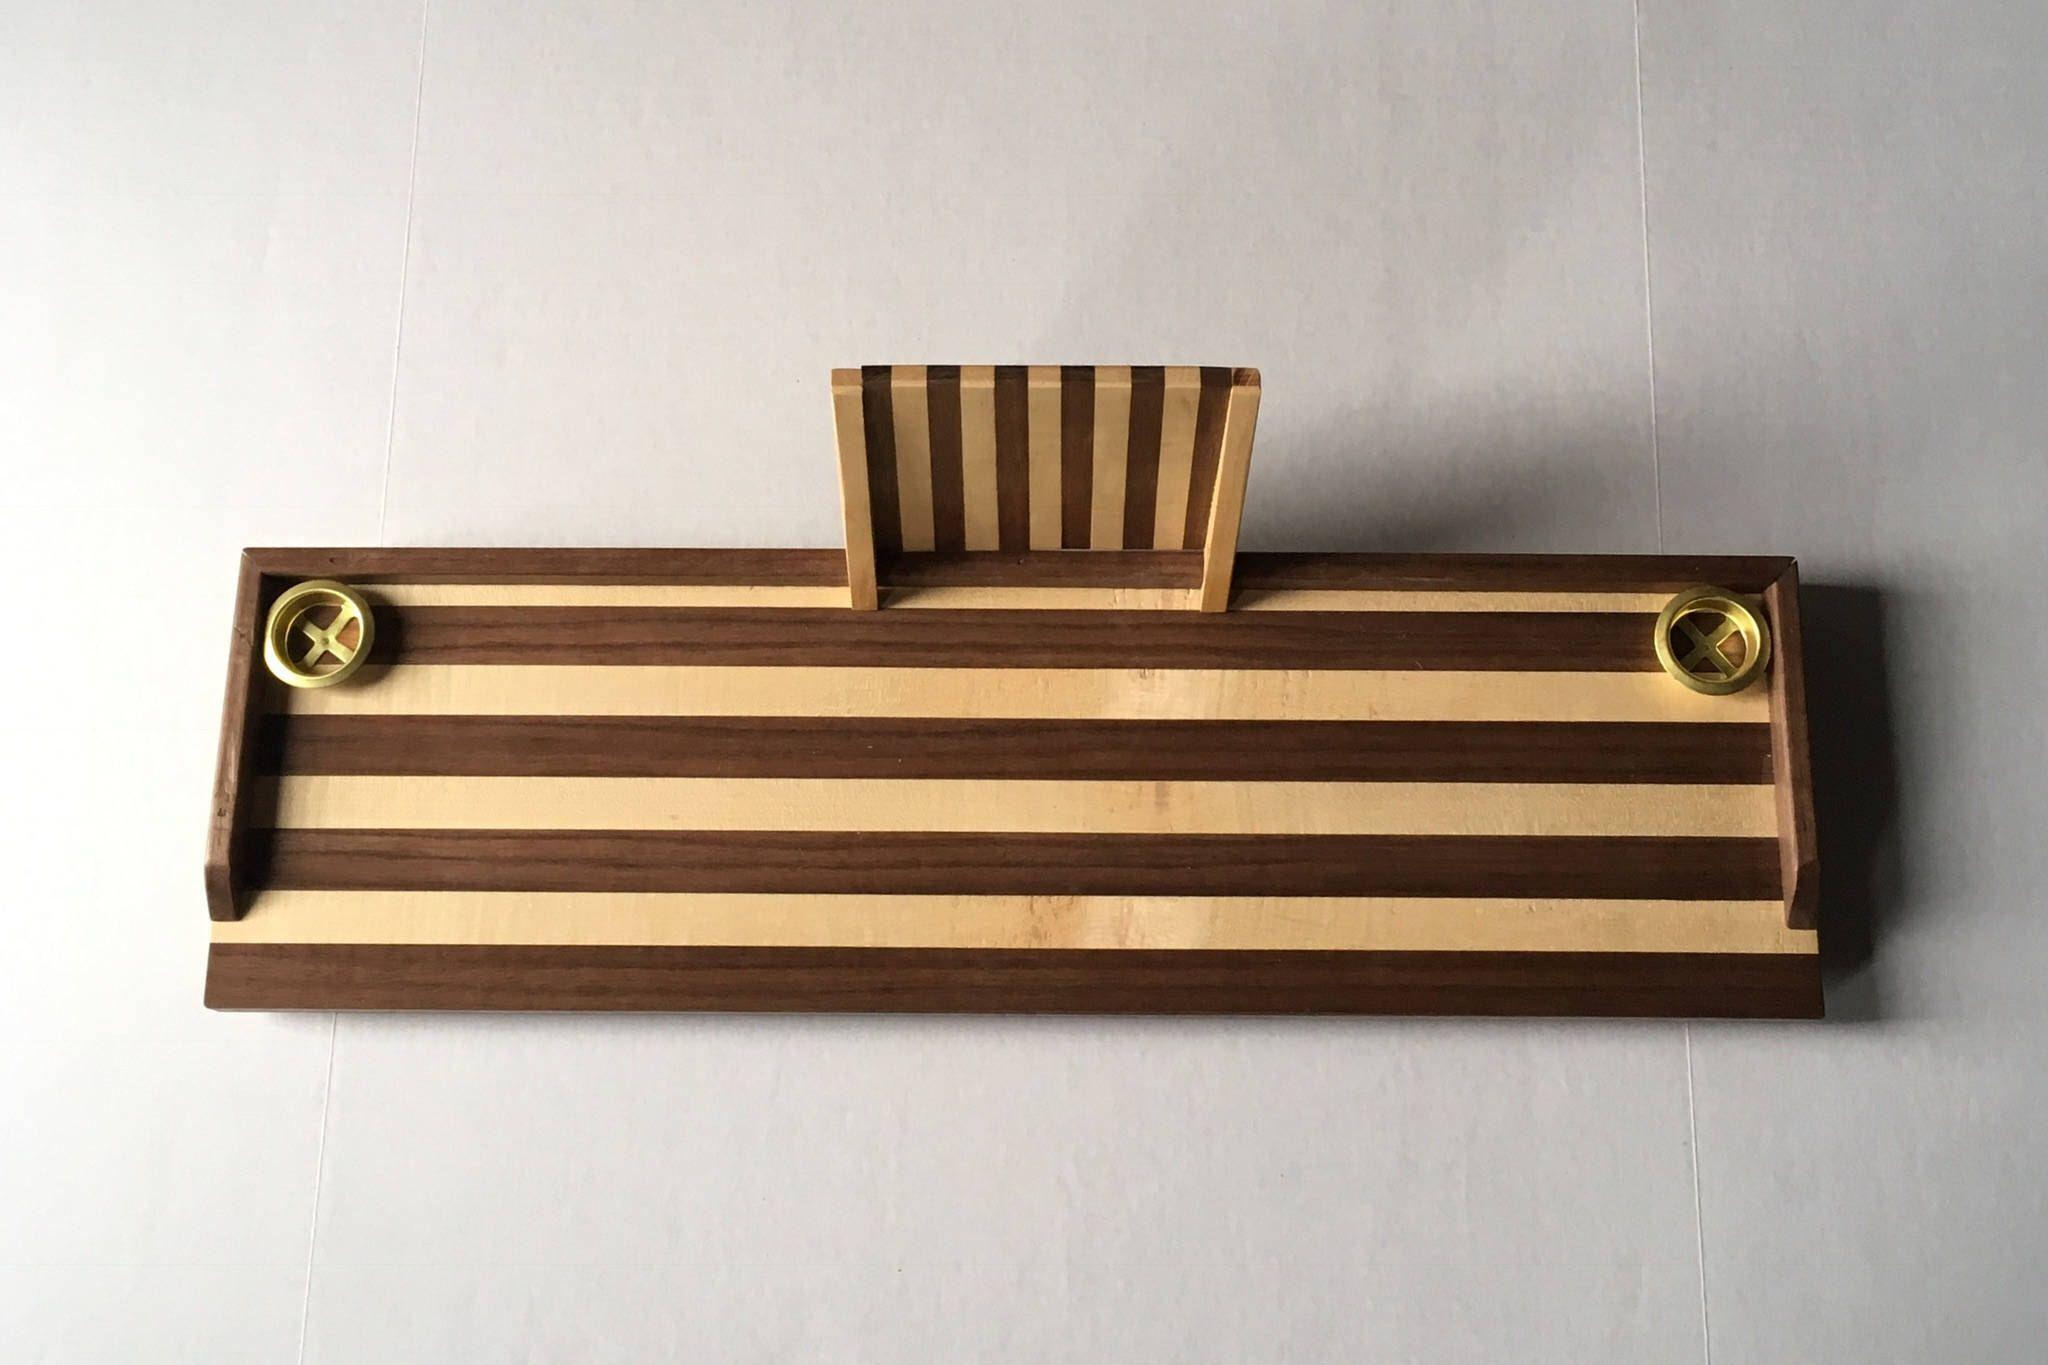 Striped walnut + sugar maple wood bath tray, bath caddy, adjustable tablet holder, Mother's Day gift, gift for her, bathtub tray, spa, bath by RusticPineCreation on Etsy https://www.etsy.com/listing/530153247/striped-walnut-sugar-maple-wood-bath